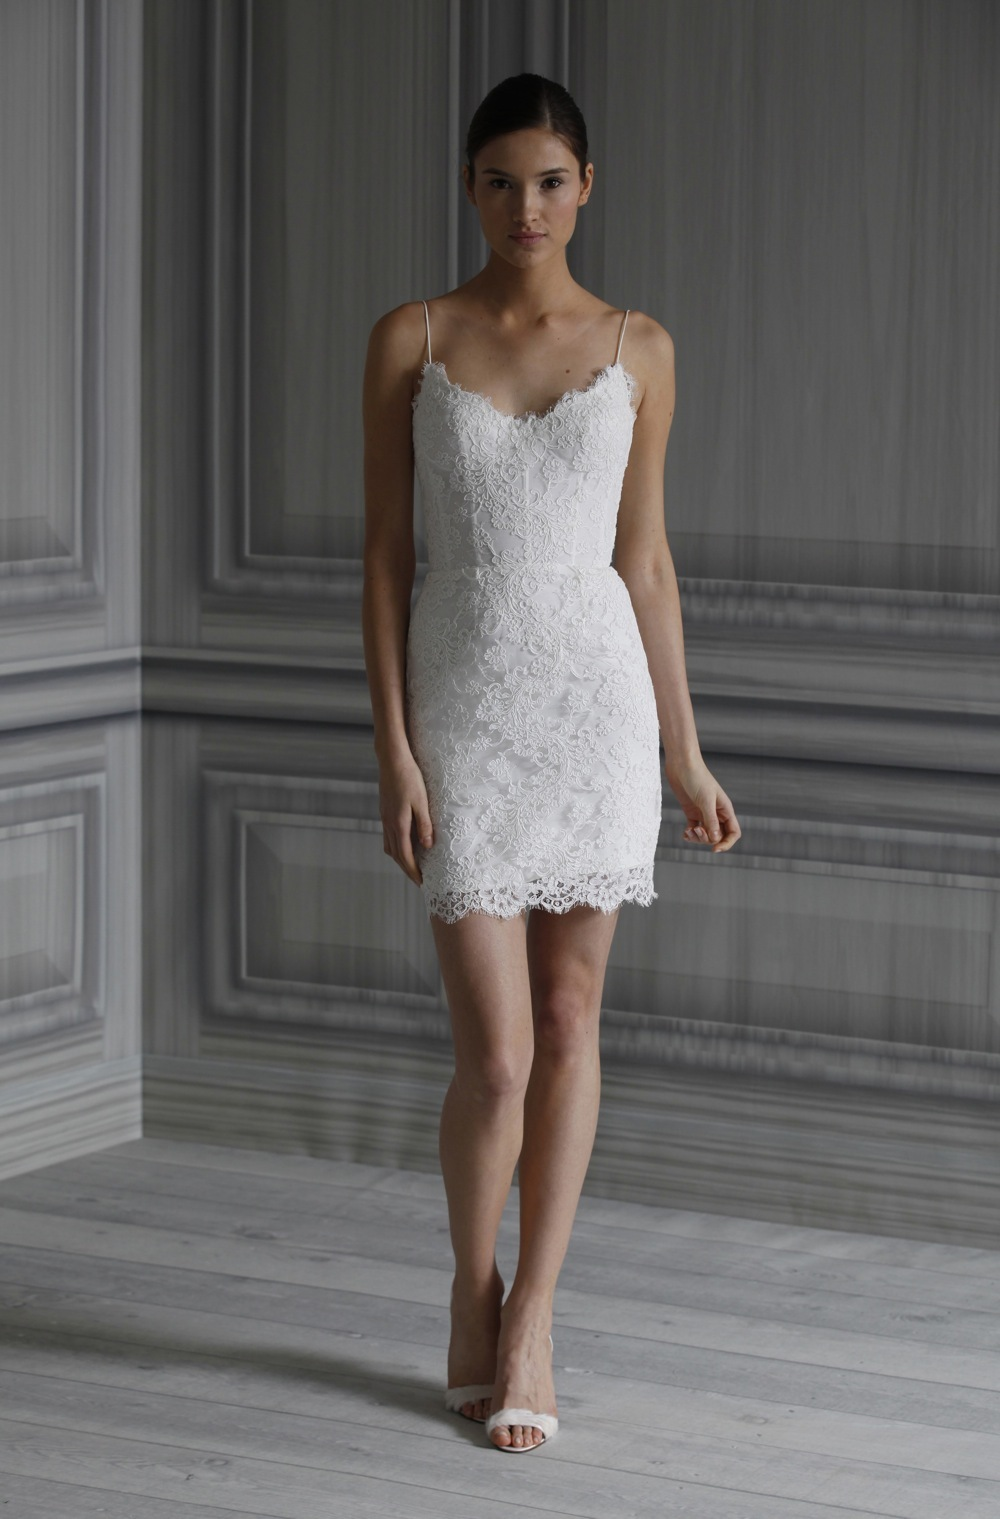 Wedding-dress-monique-lhuillier-bridal-gowns-spring-2012-pippa.full